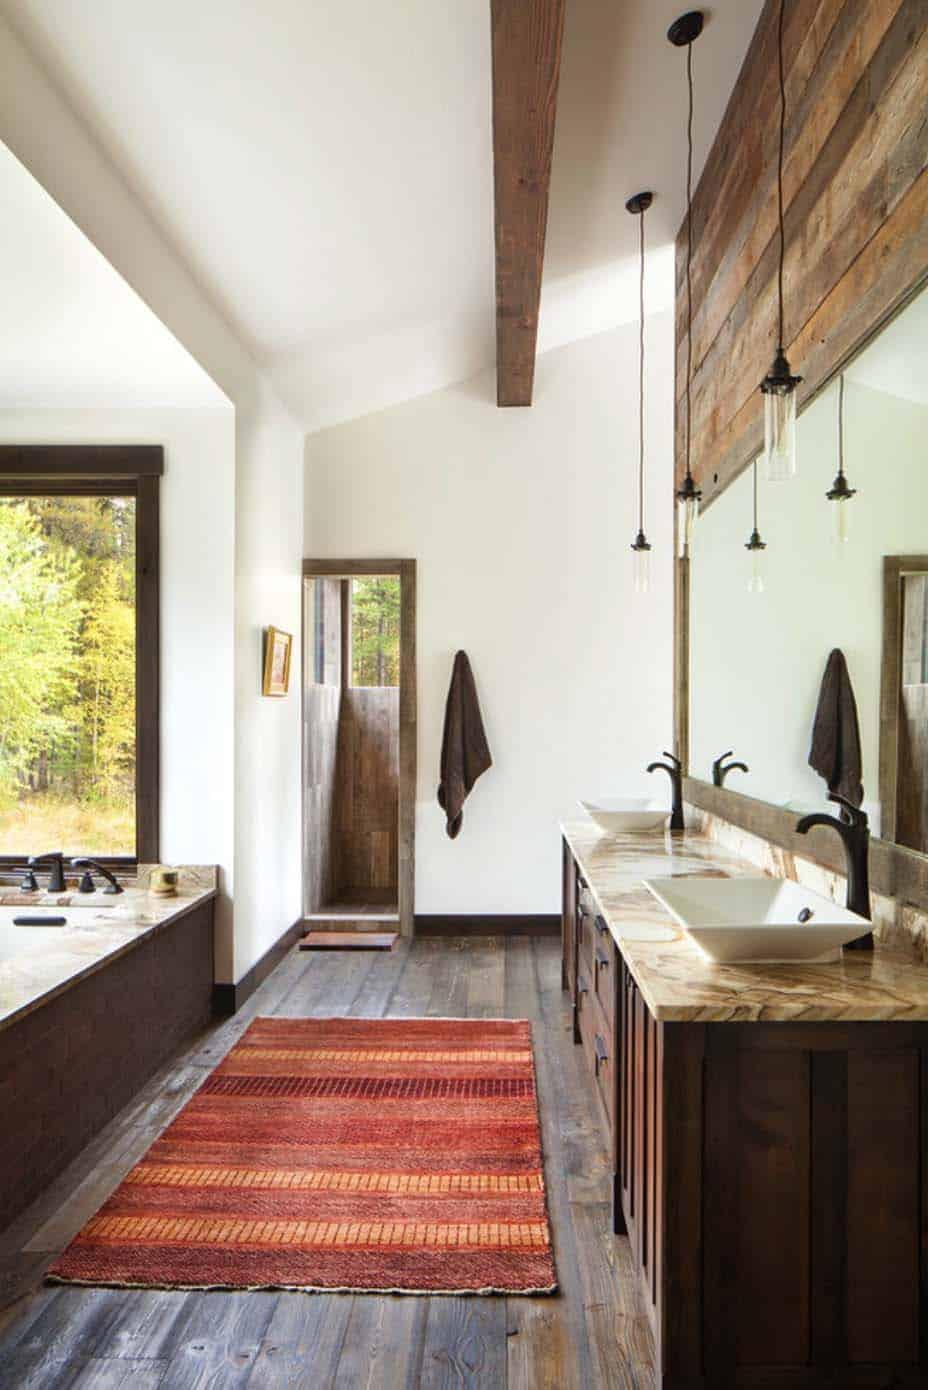 Rustic-Modern Dwelling-Sage Interior Design-07-1 Kindesign